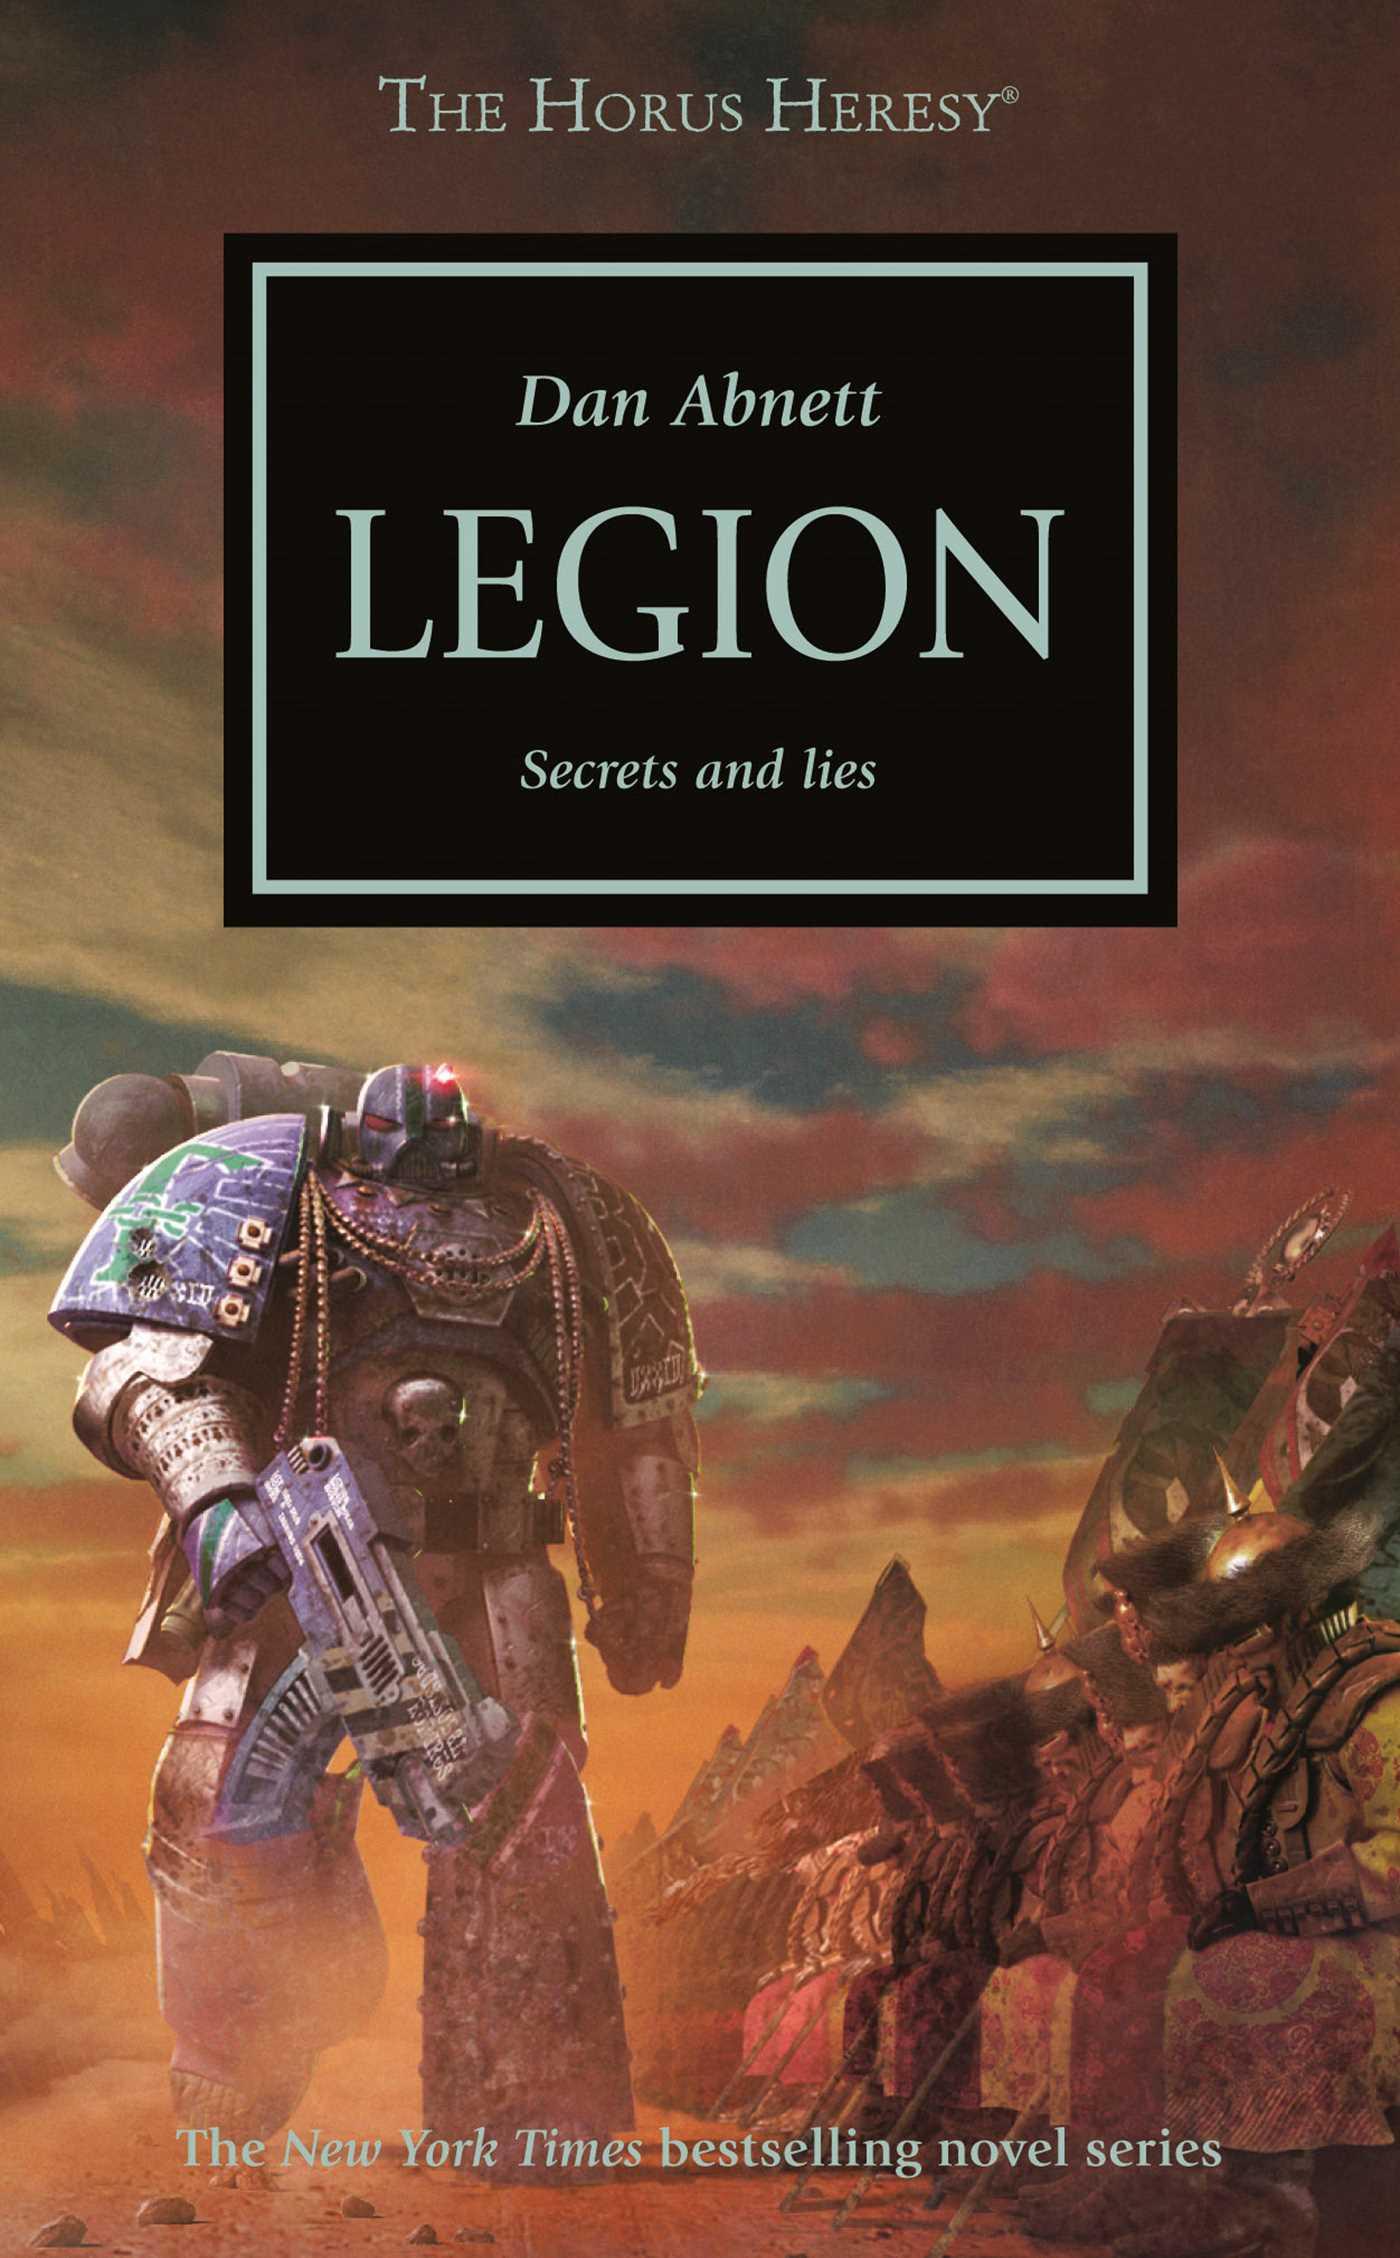 Legion 9781849708159 hr